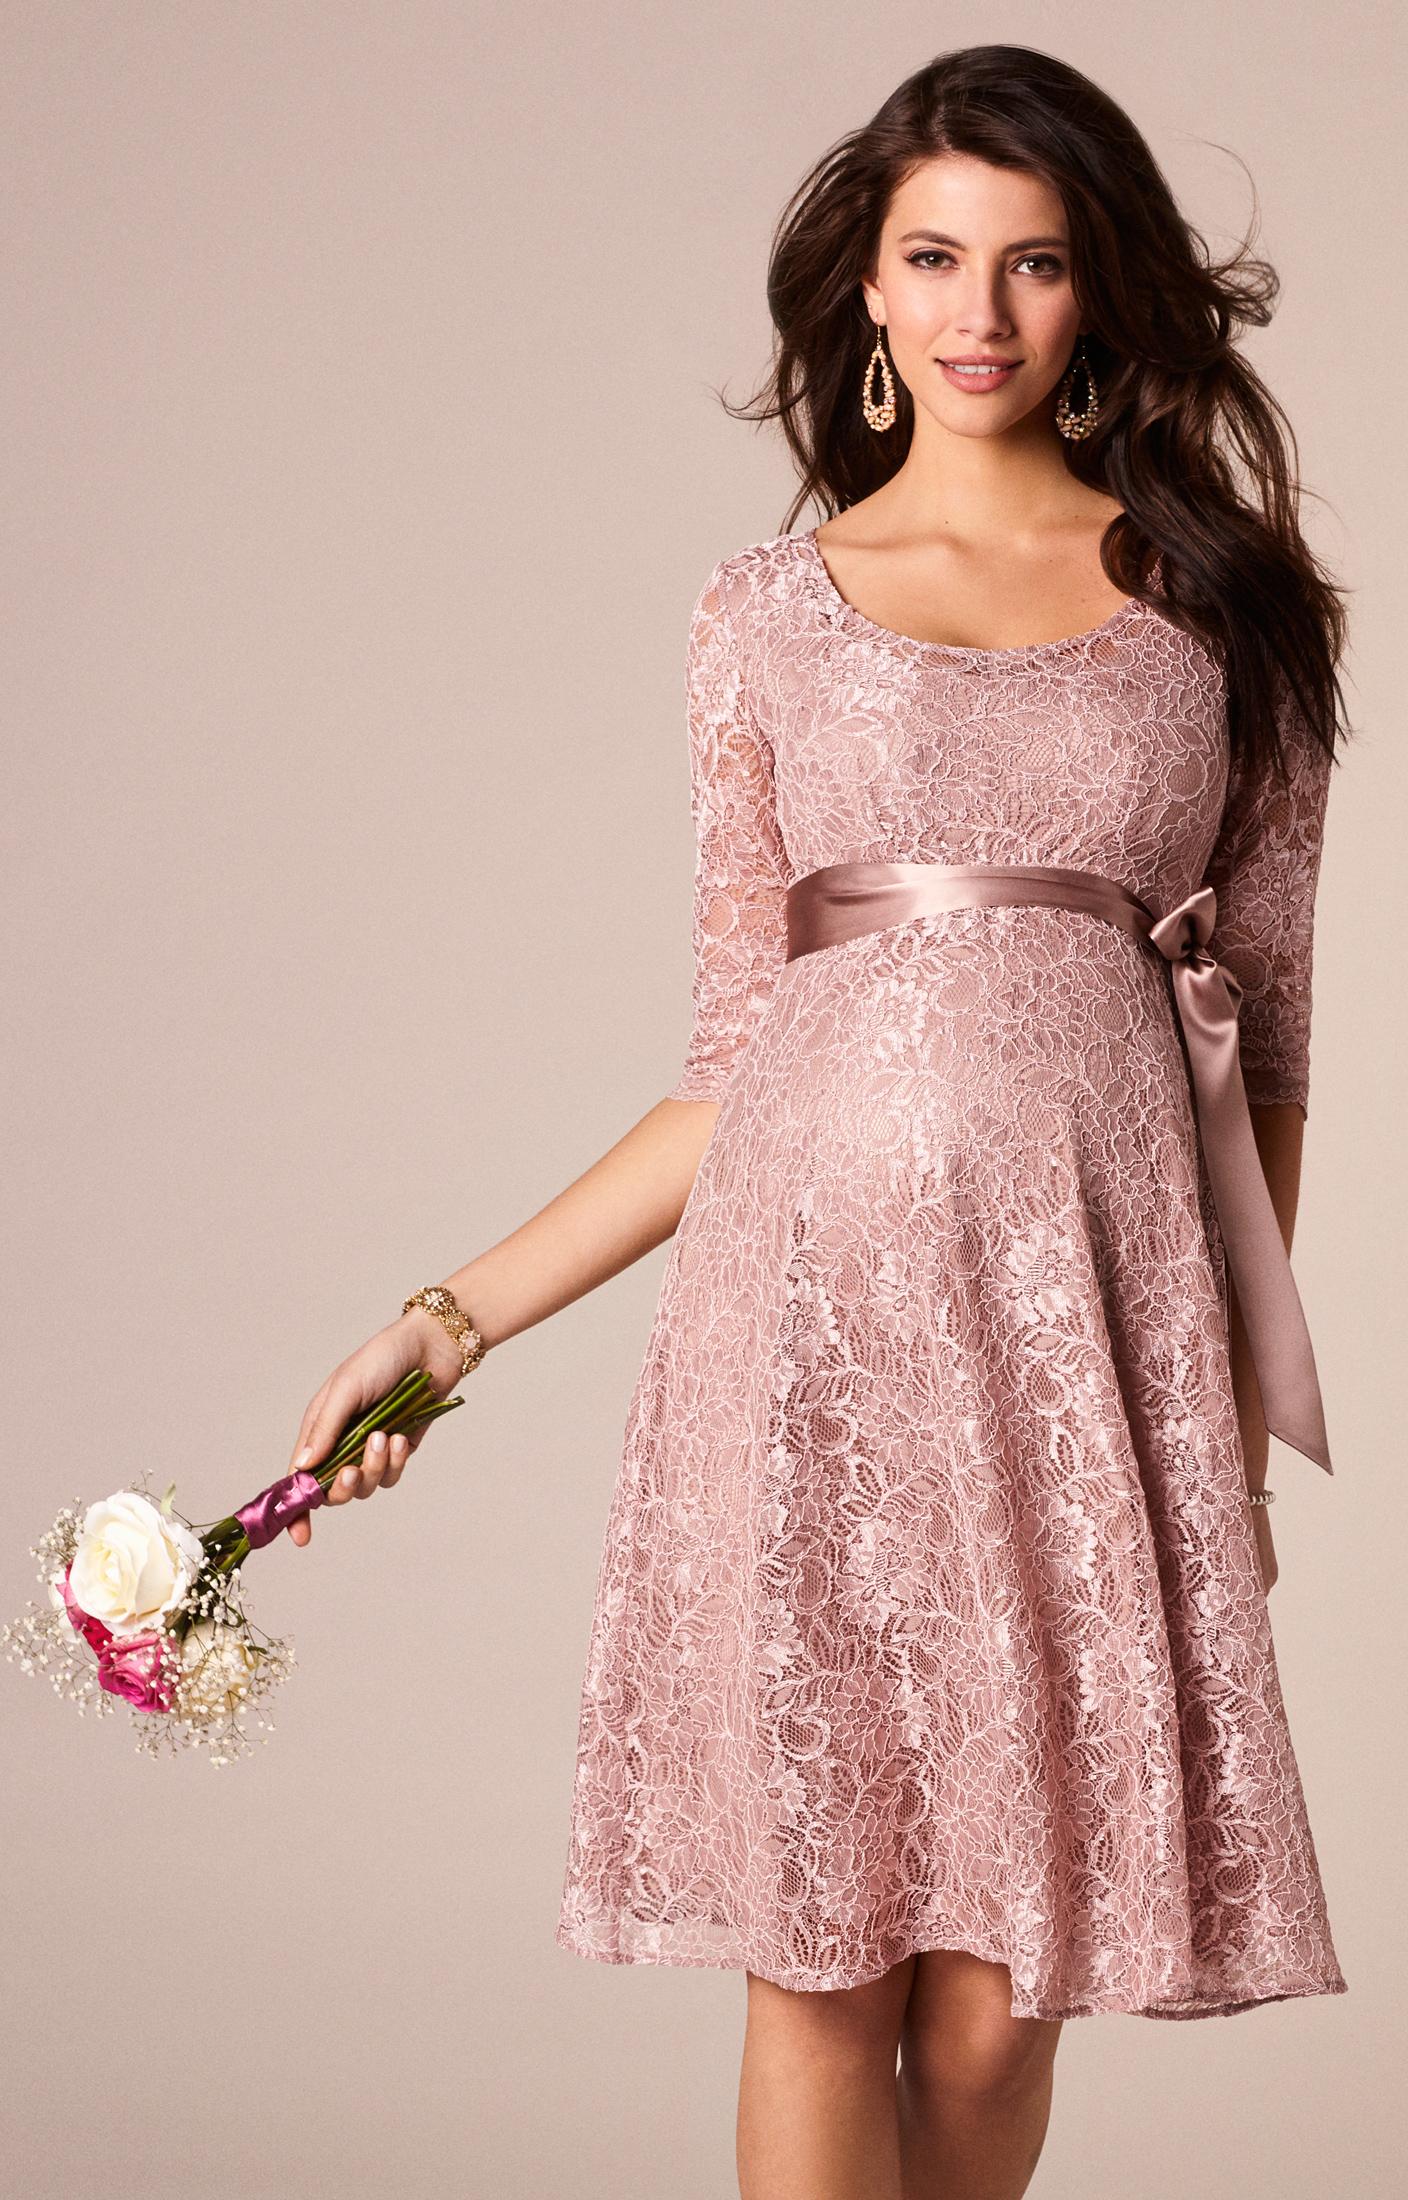 Maternity Dresses For Wedding.Freya Dress